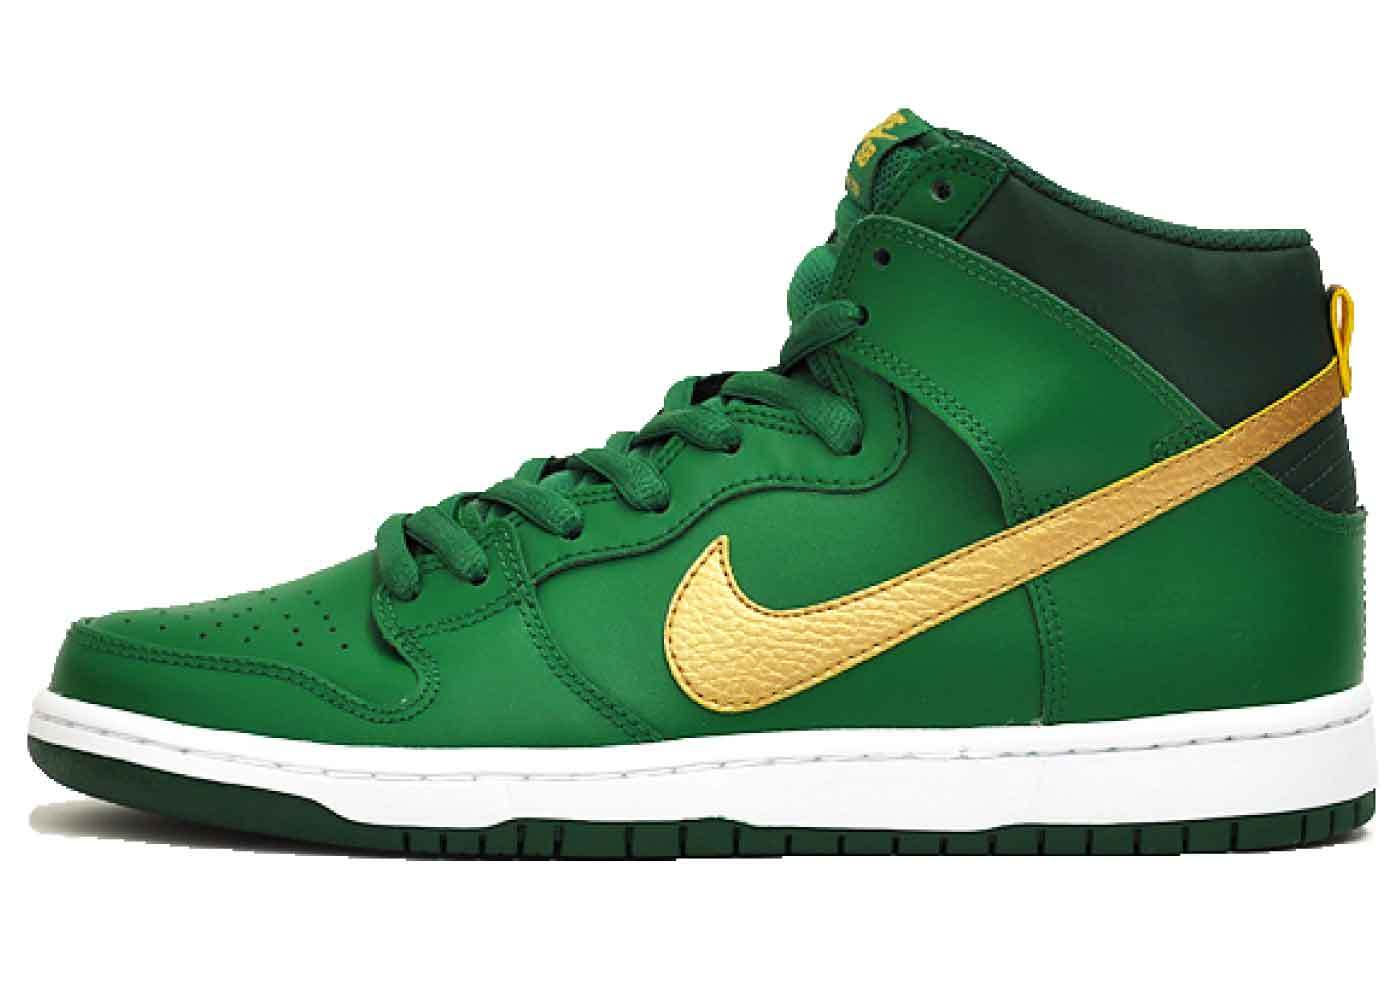 Nike Dunk SB High St Patty's Dayの写真